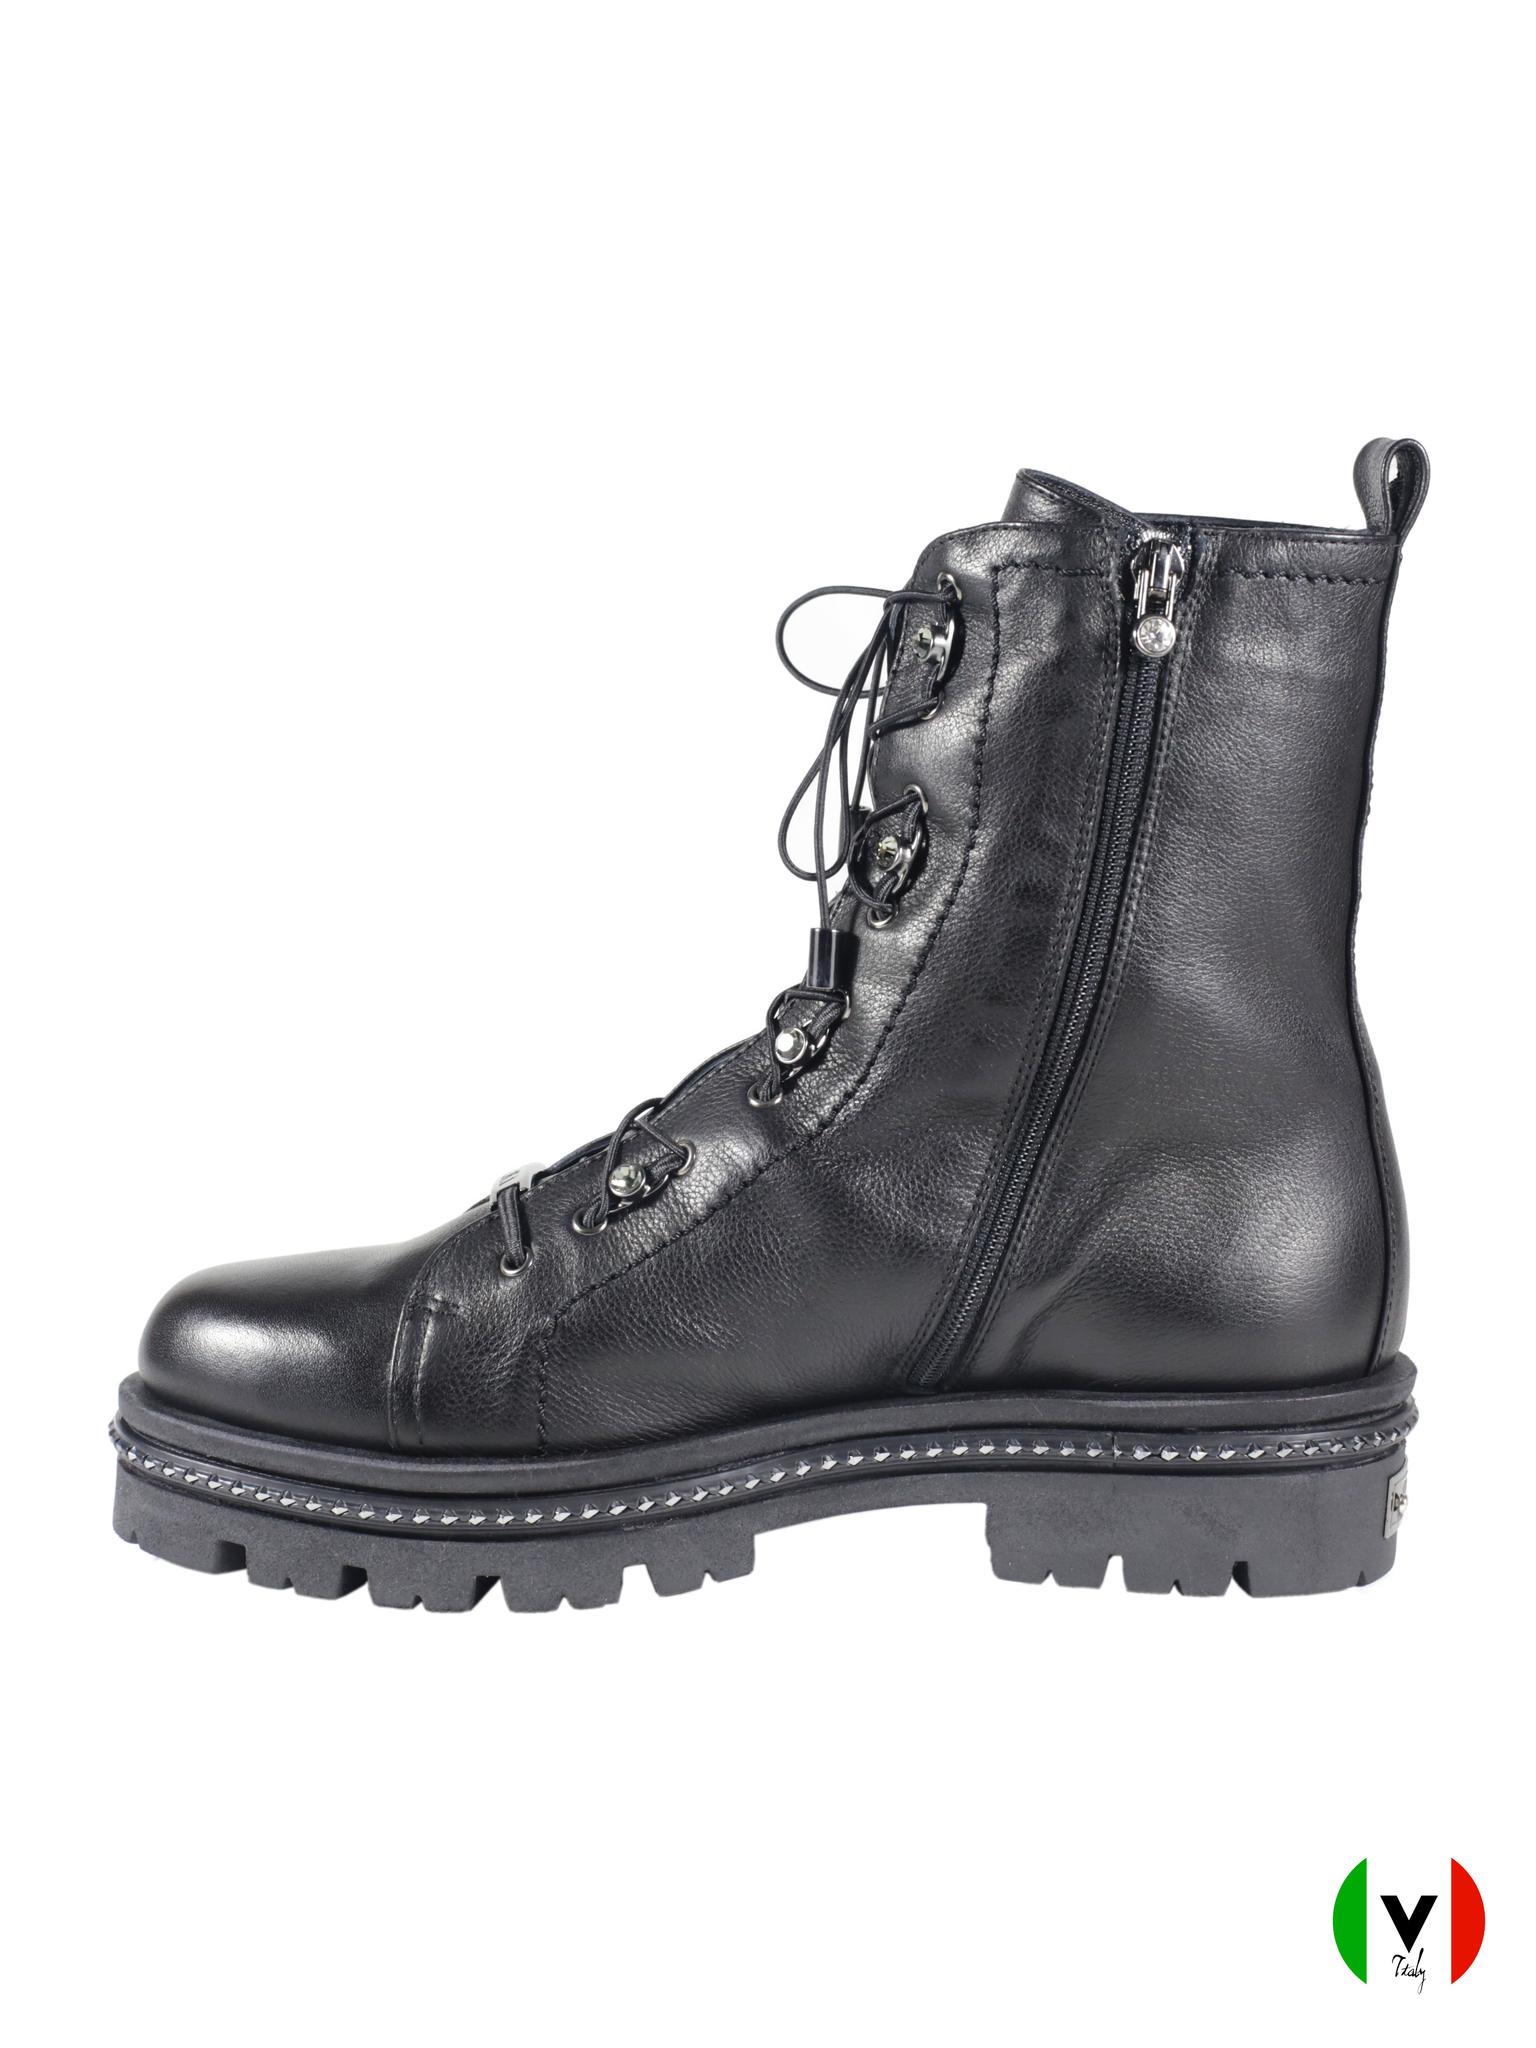 Зимние ботинки Mara со шнуровкой 804, артикул 804, сезон зима, цвет чёрный, материал кожа, цена 19 500 руб., veroitaly.ru